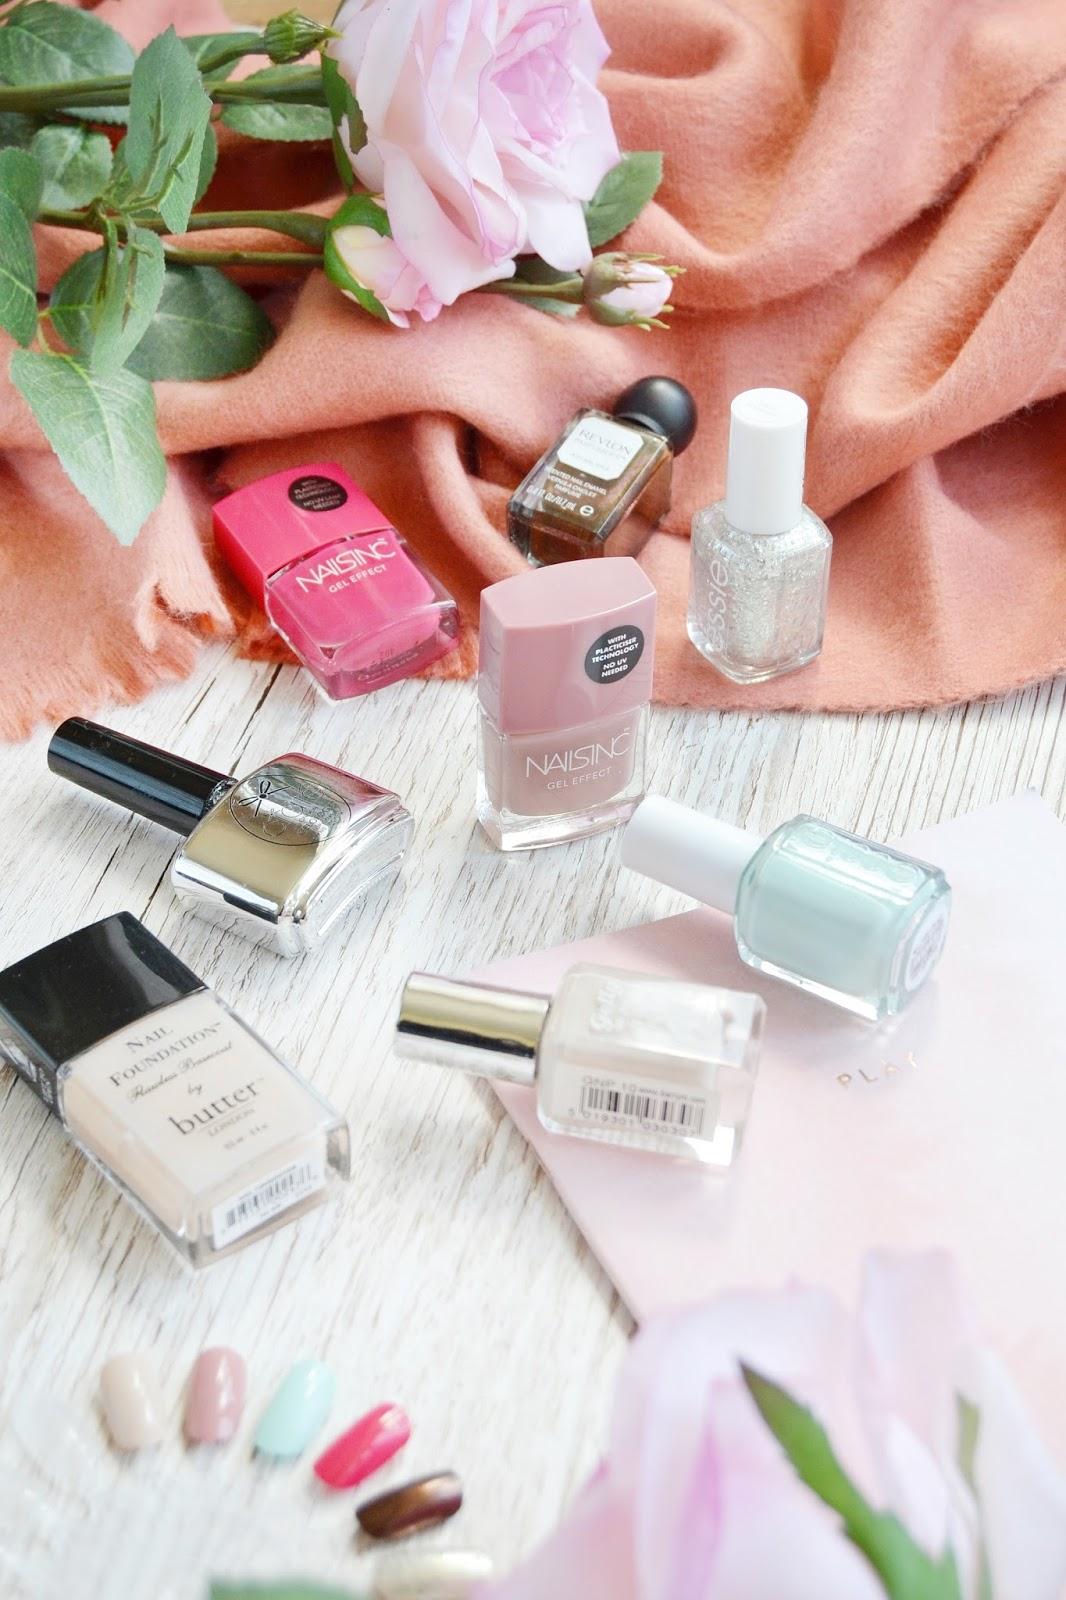 My Most Worn Nail Polishes | Makeup Savvy - makeup and beauty blog